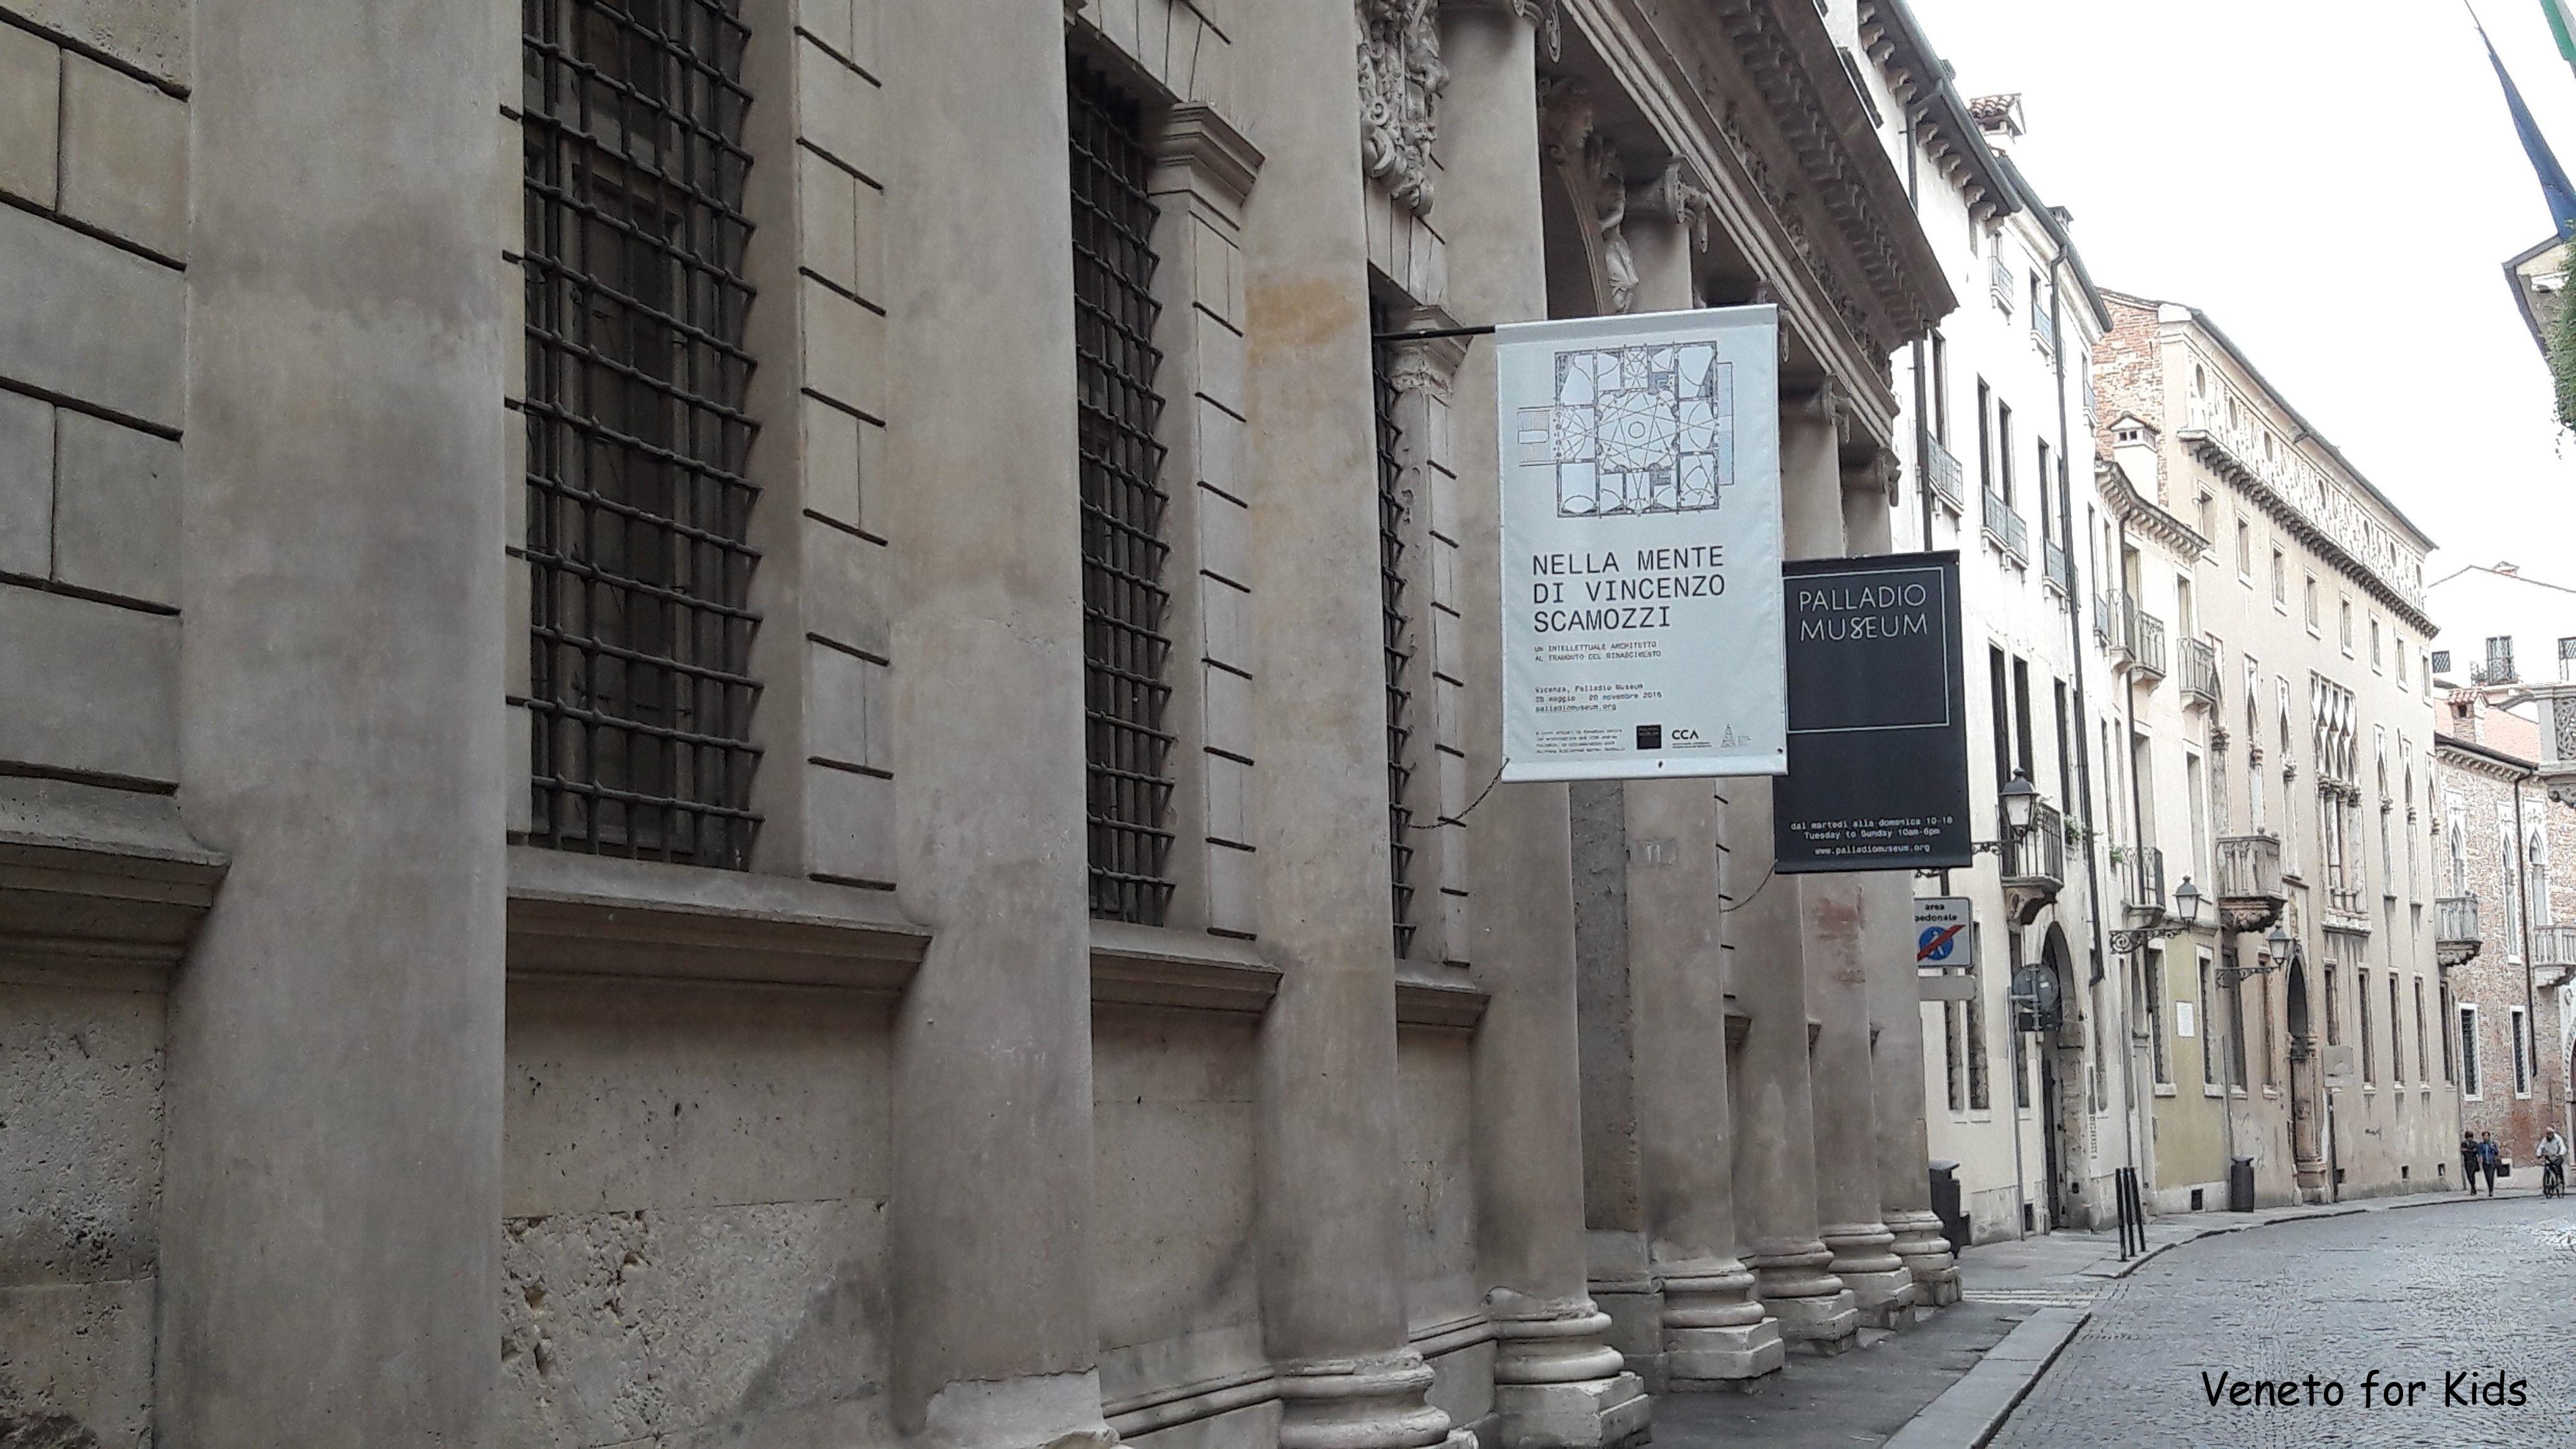 palladio museum vicenza